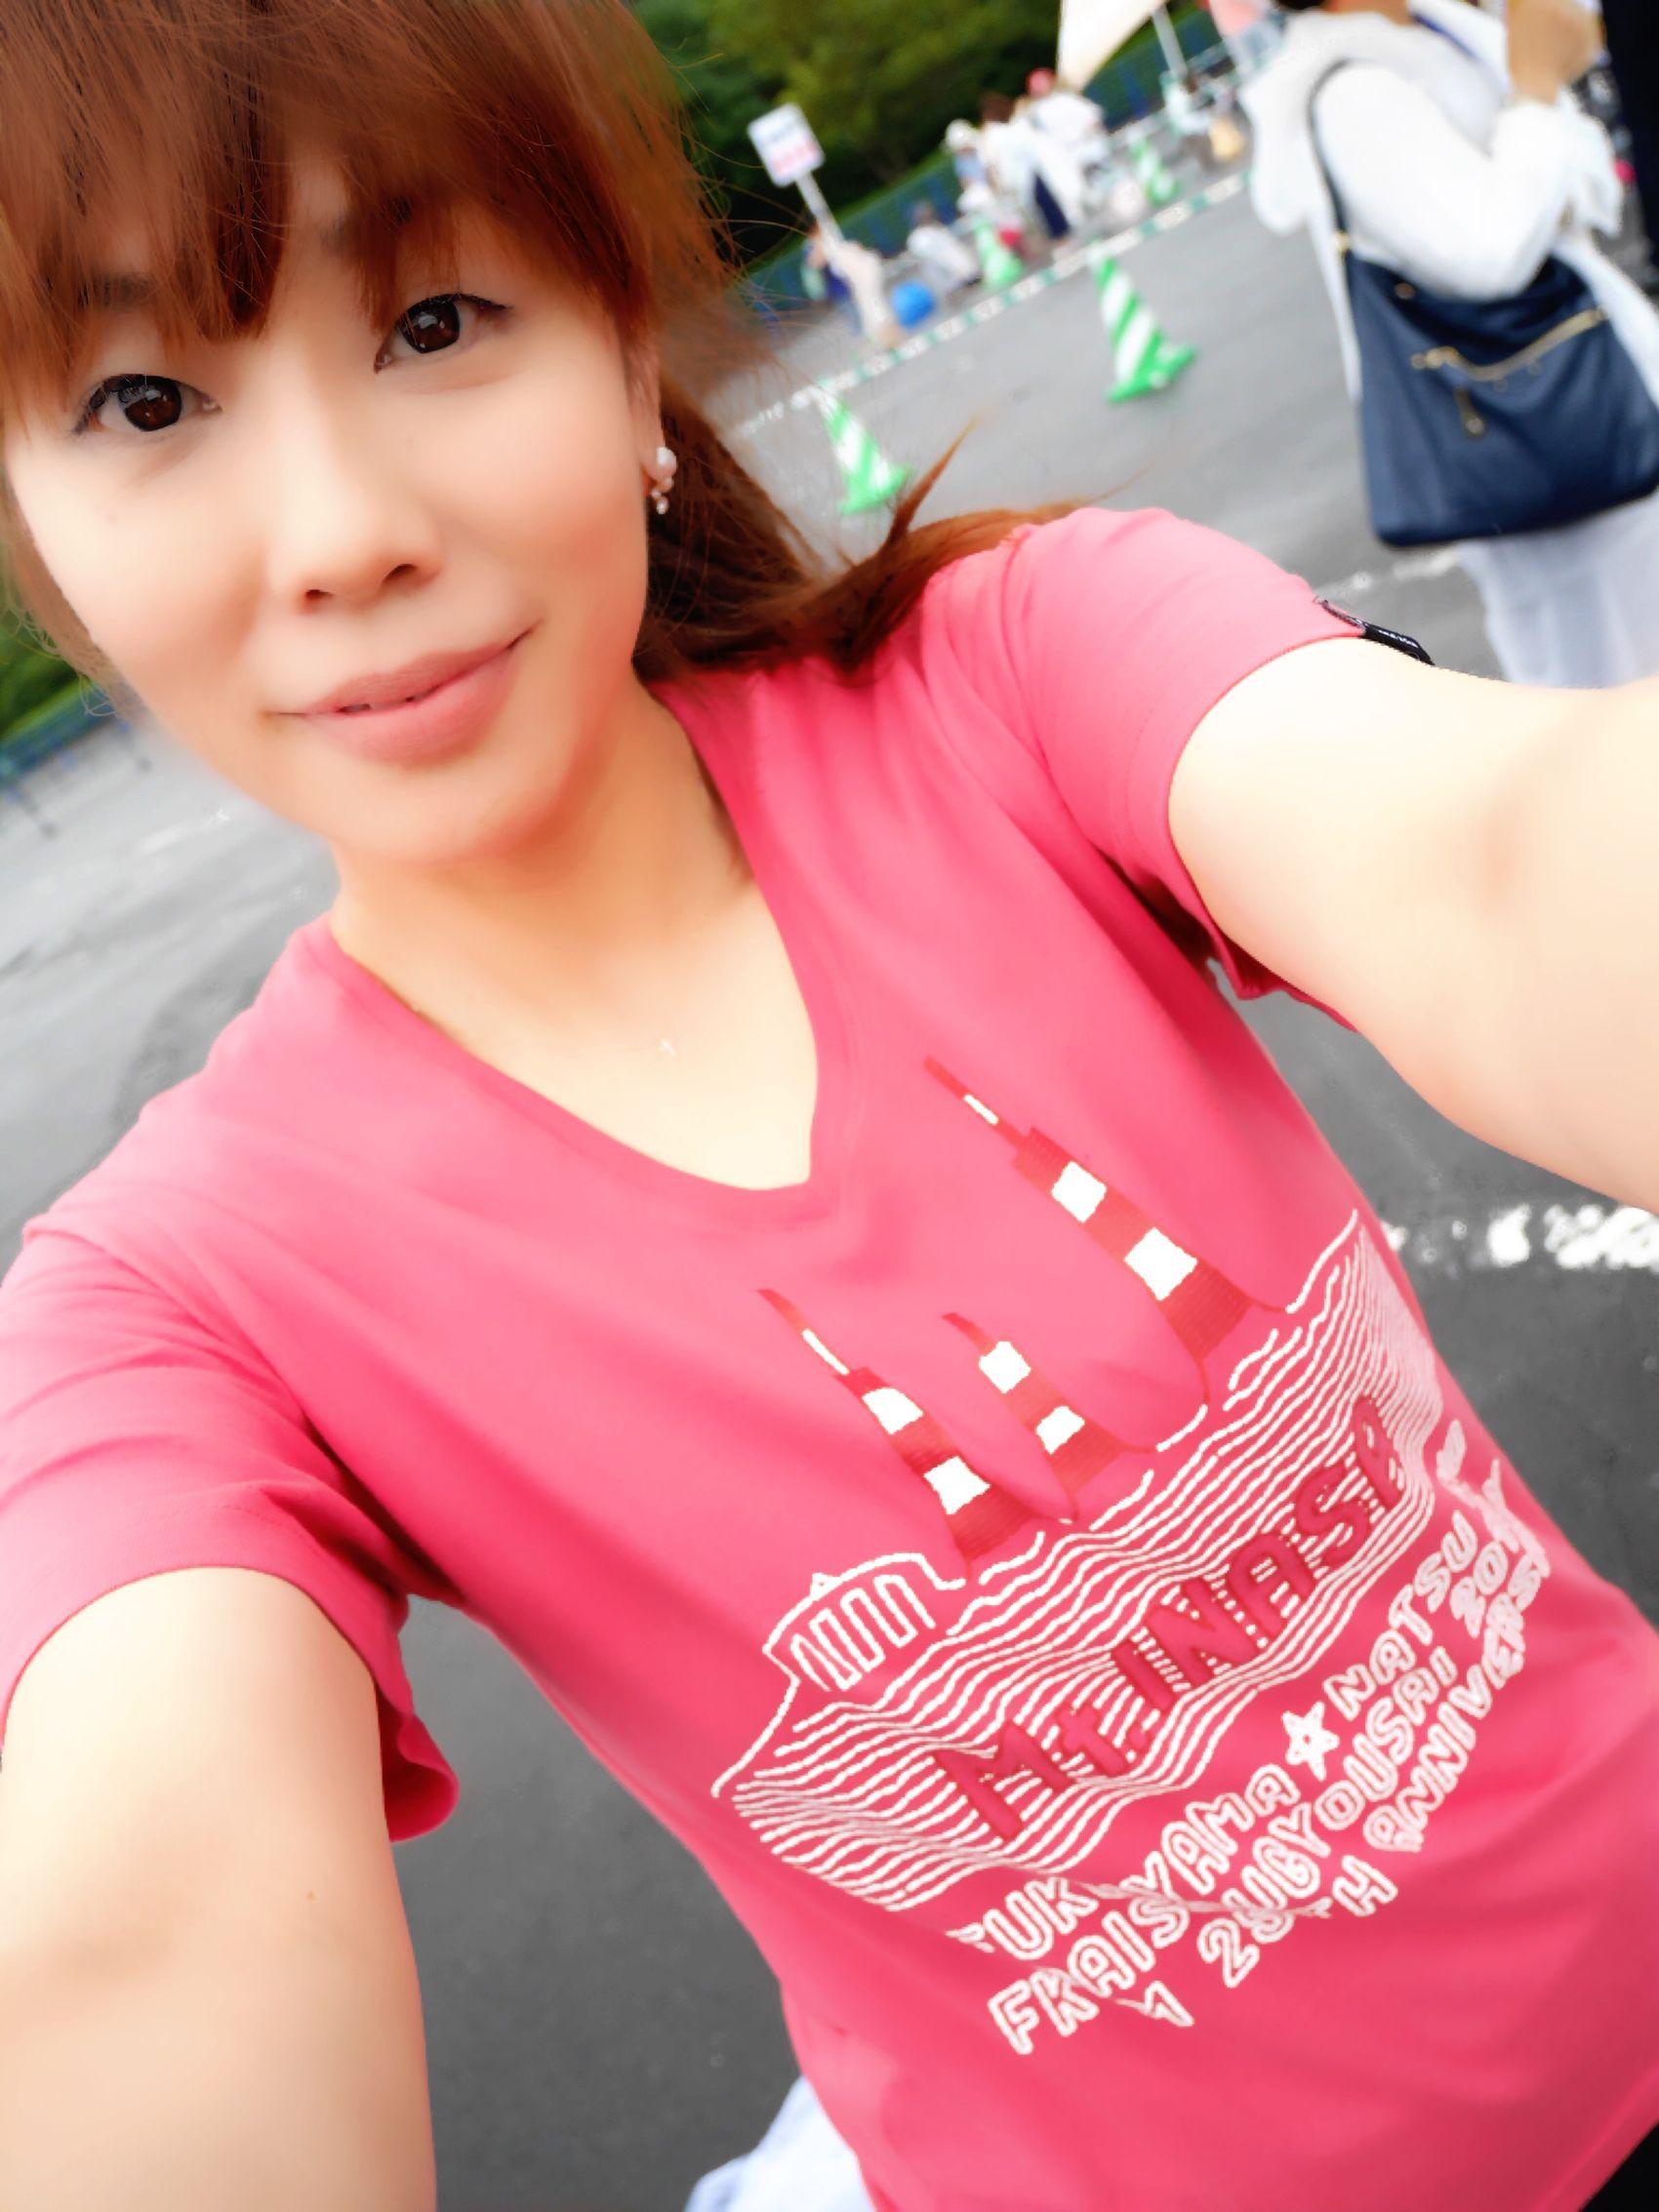 T-shirt 福山雅治 Taking Photos Enjoying Life Selfportrait Lumix Gf7 Lumix